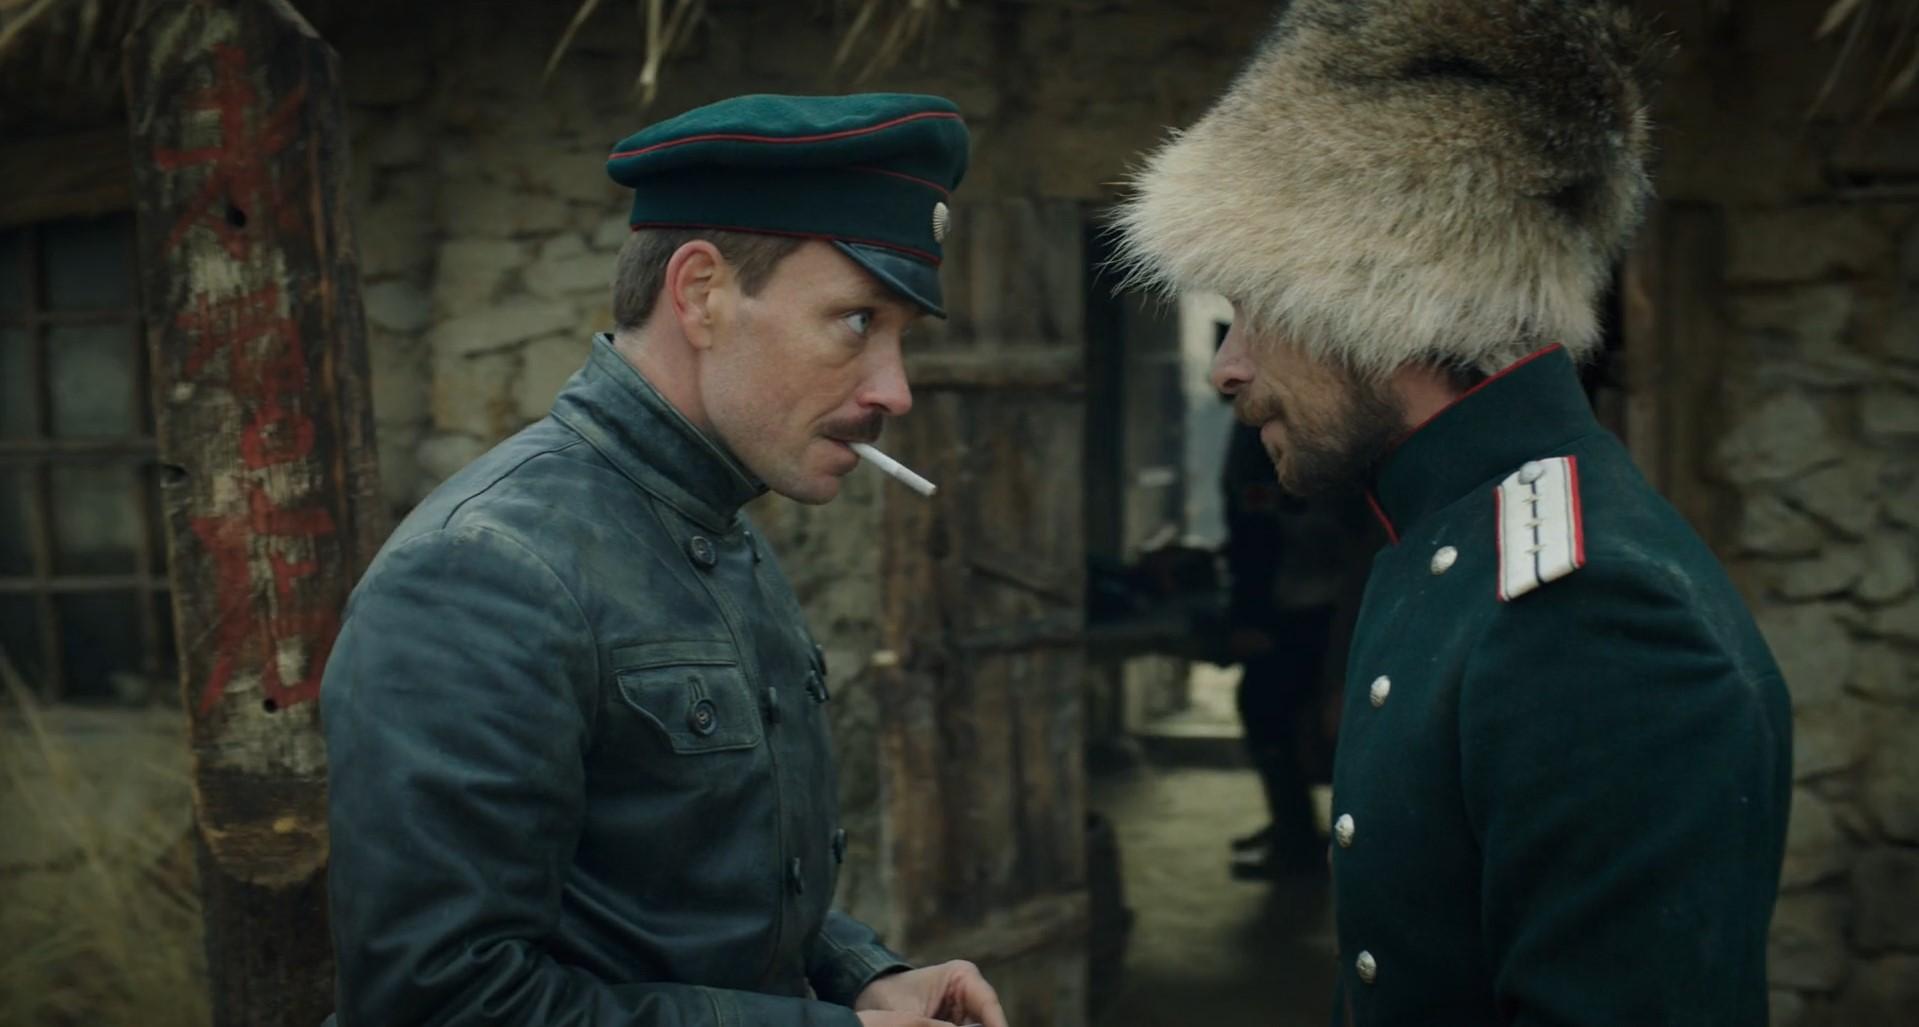 Фильм: Анна Каренина (2017)